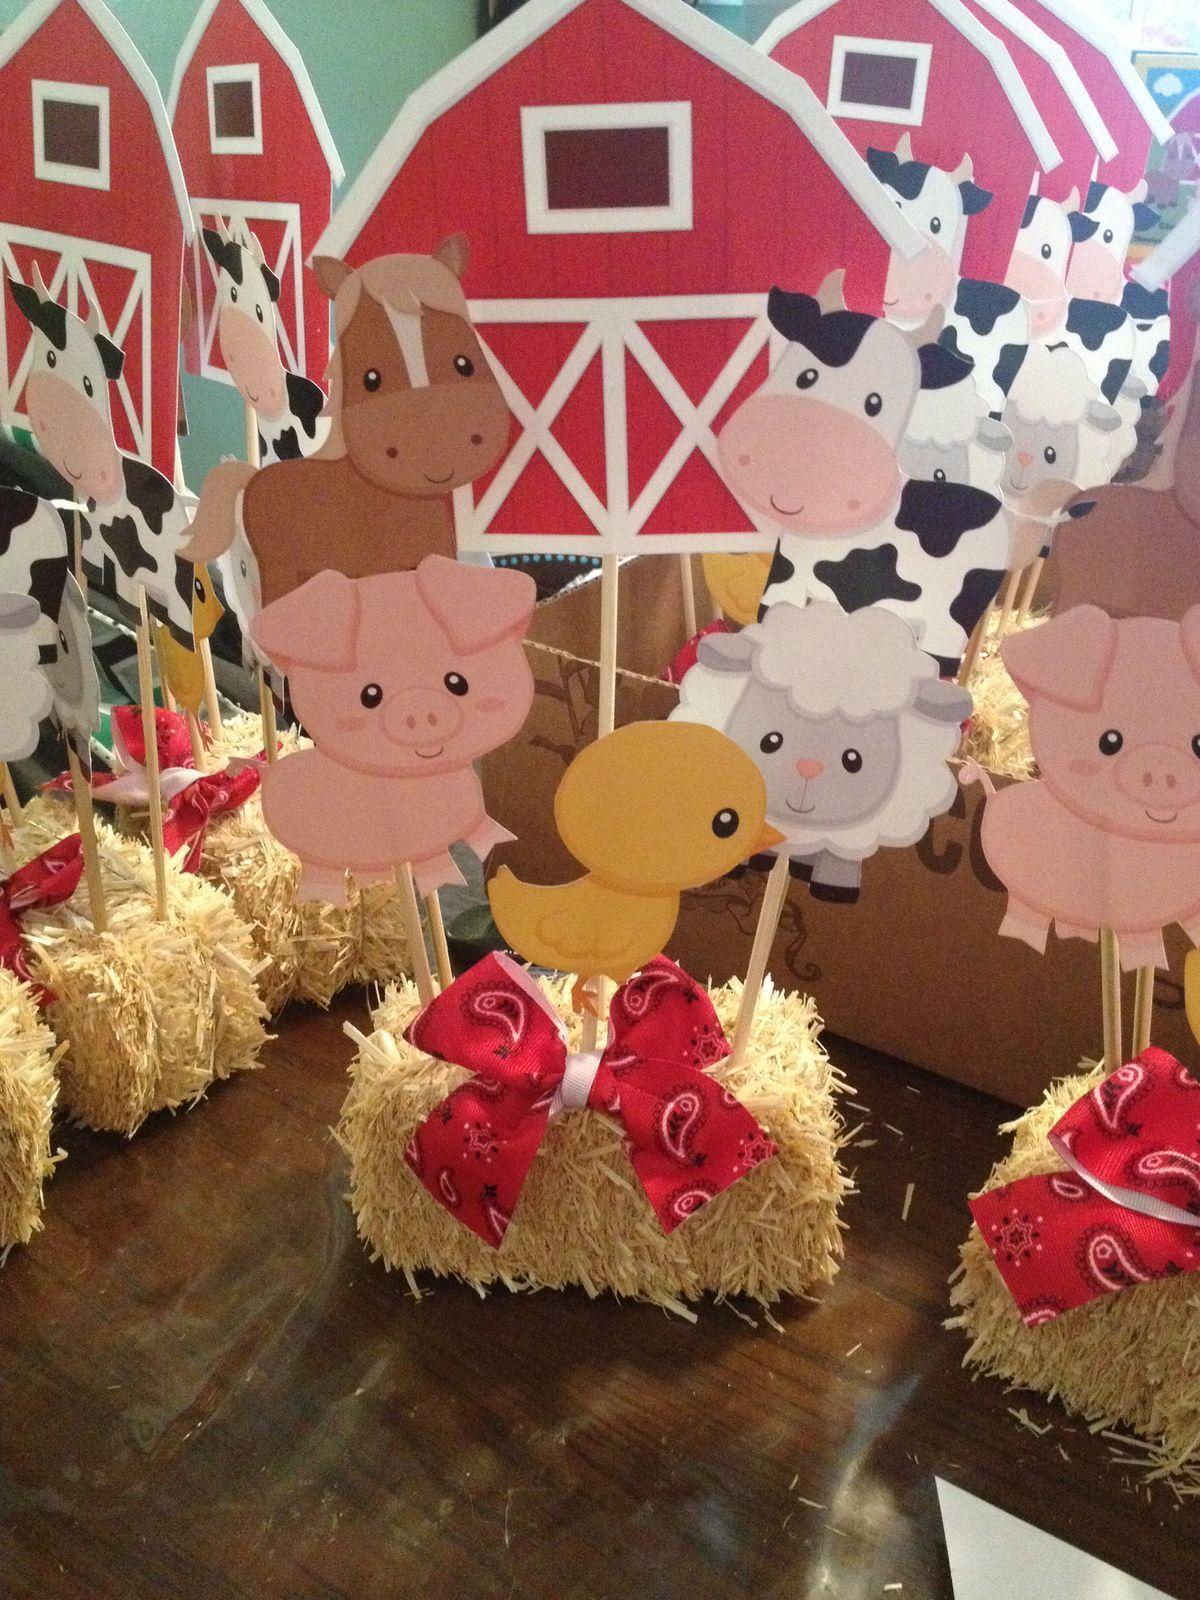 Pin By Ceci Alvarez On Bday Farm Animal Party Birthday